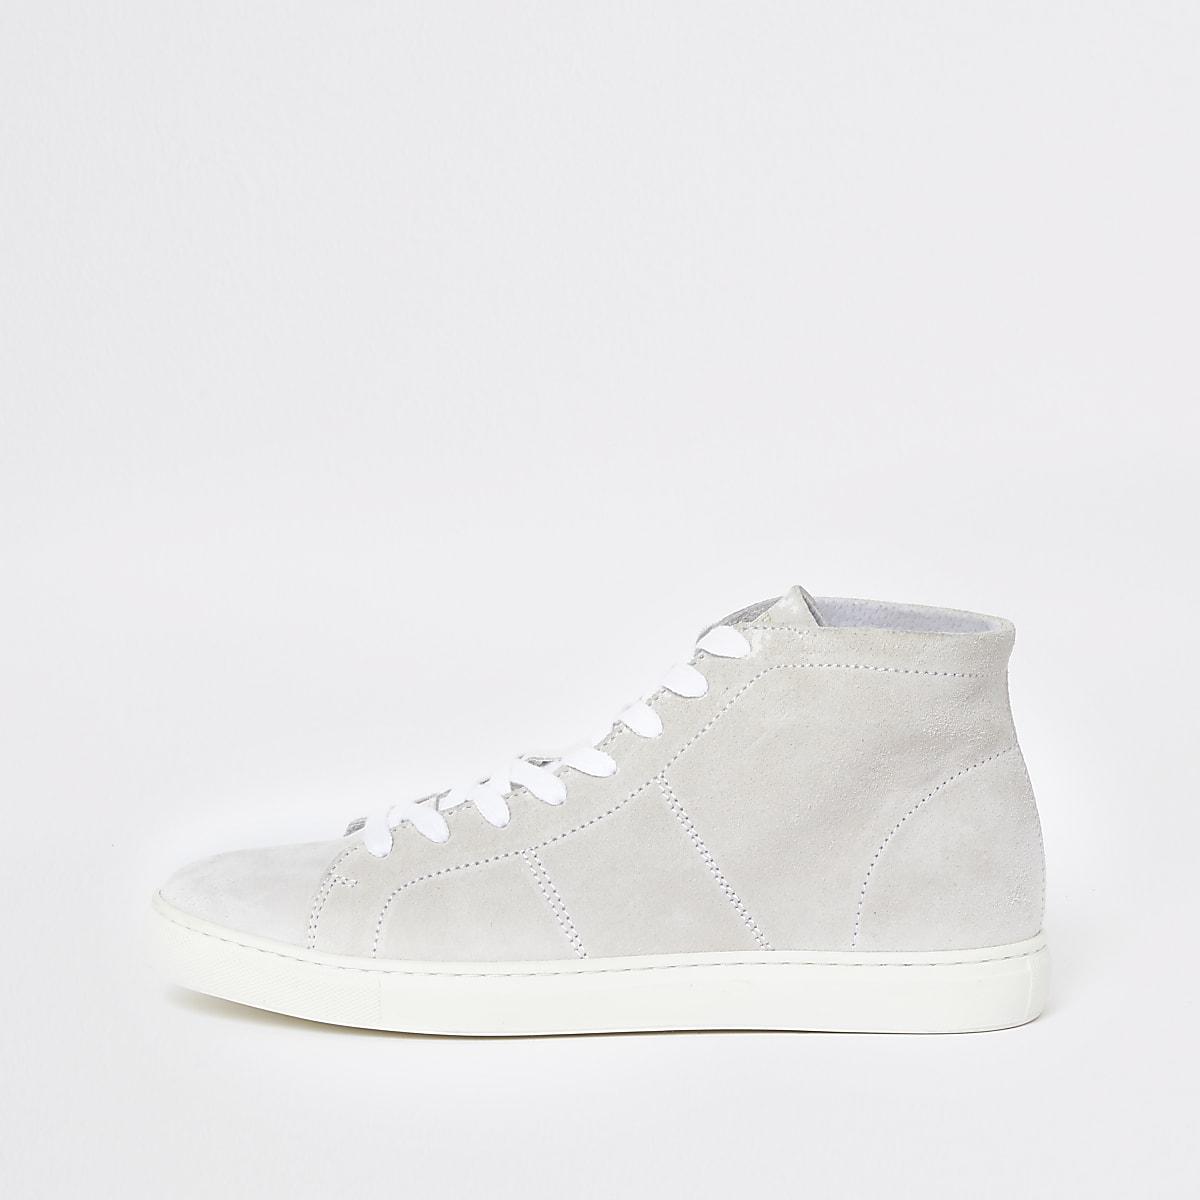 Selected Homme – Weiße High-Top-Sneaker